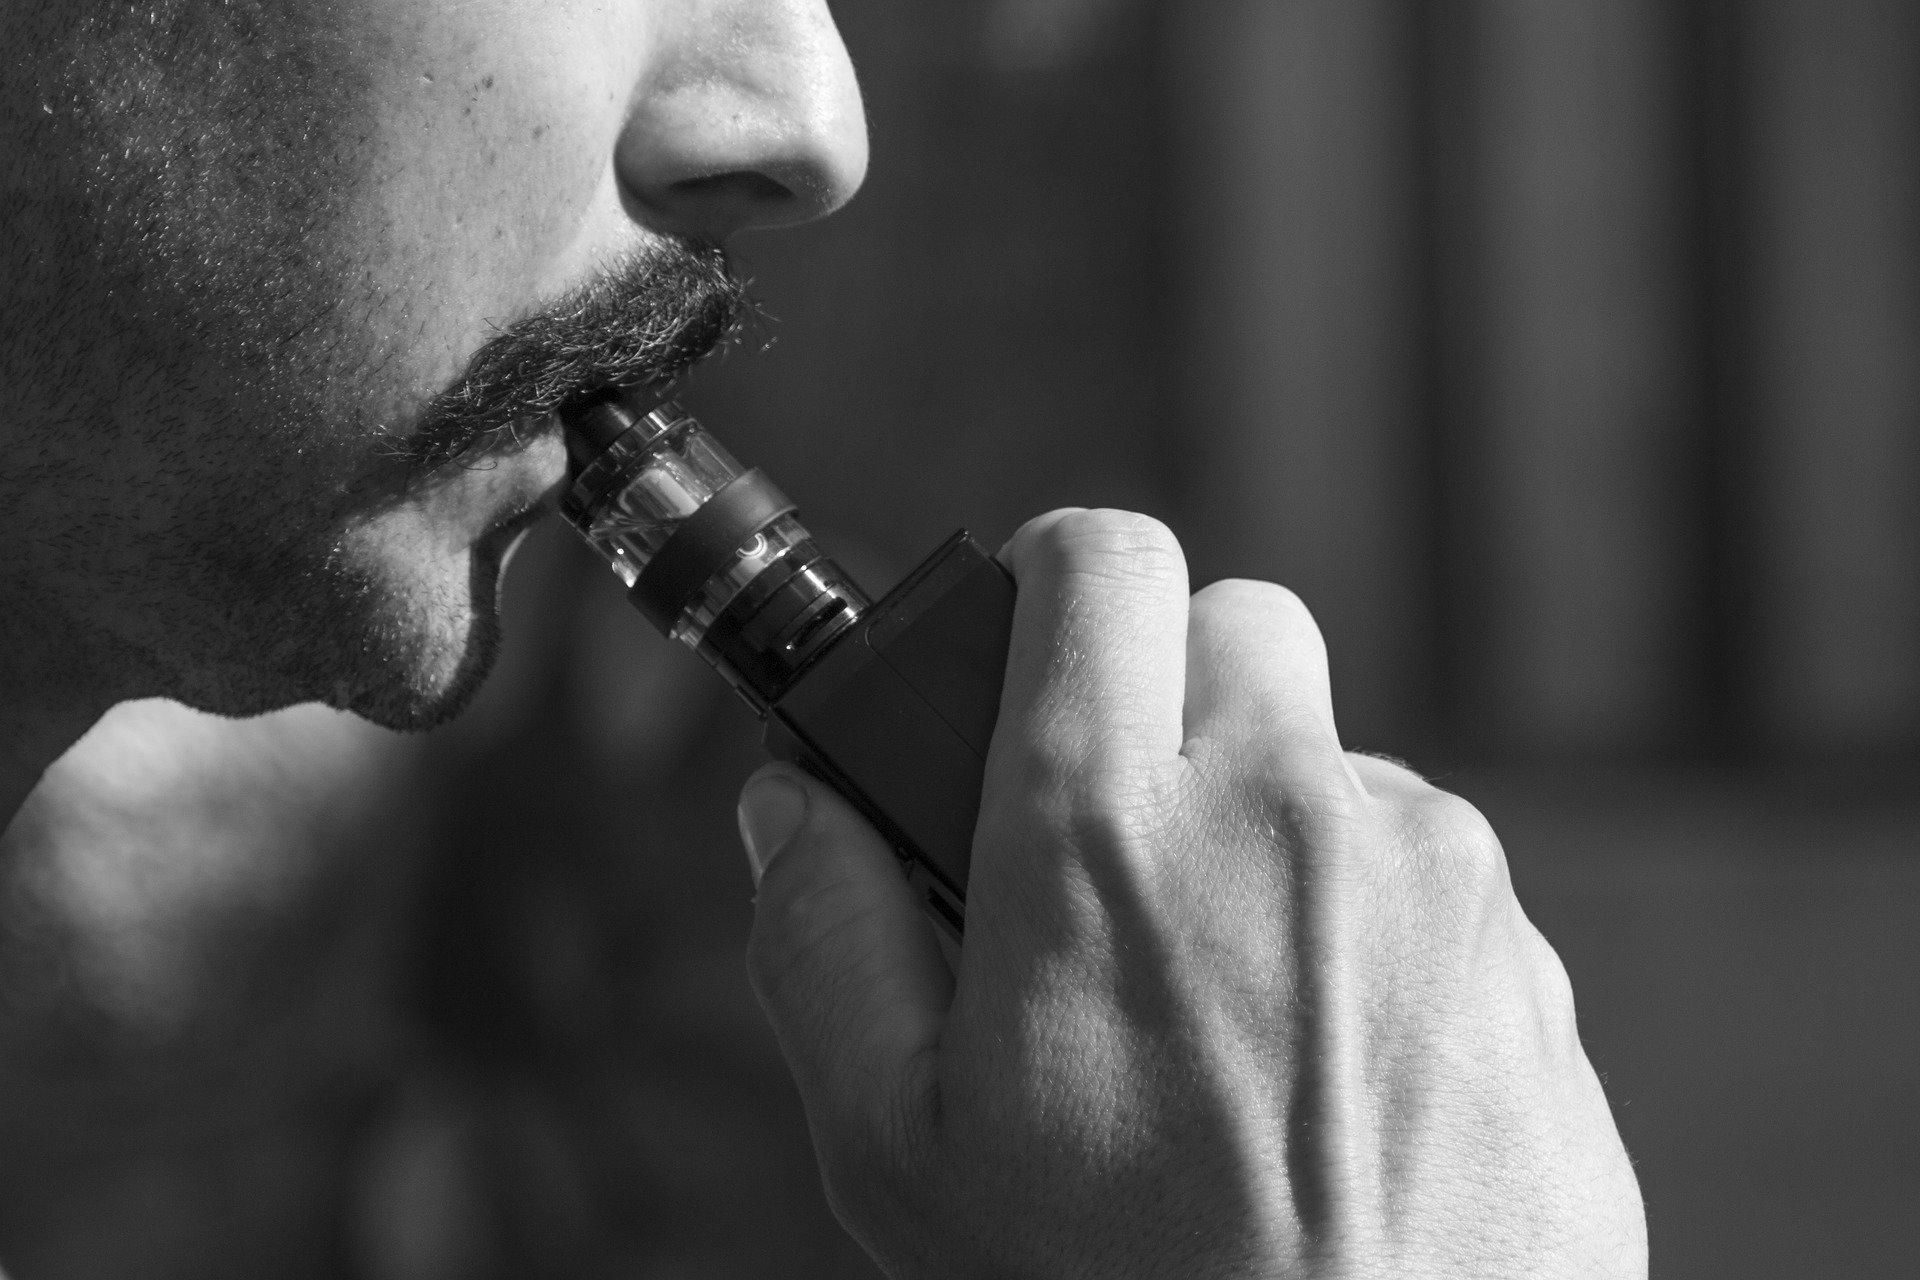 vapers do not undermine desire to quit smoking